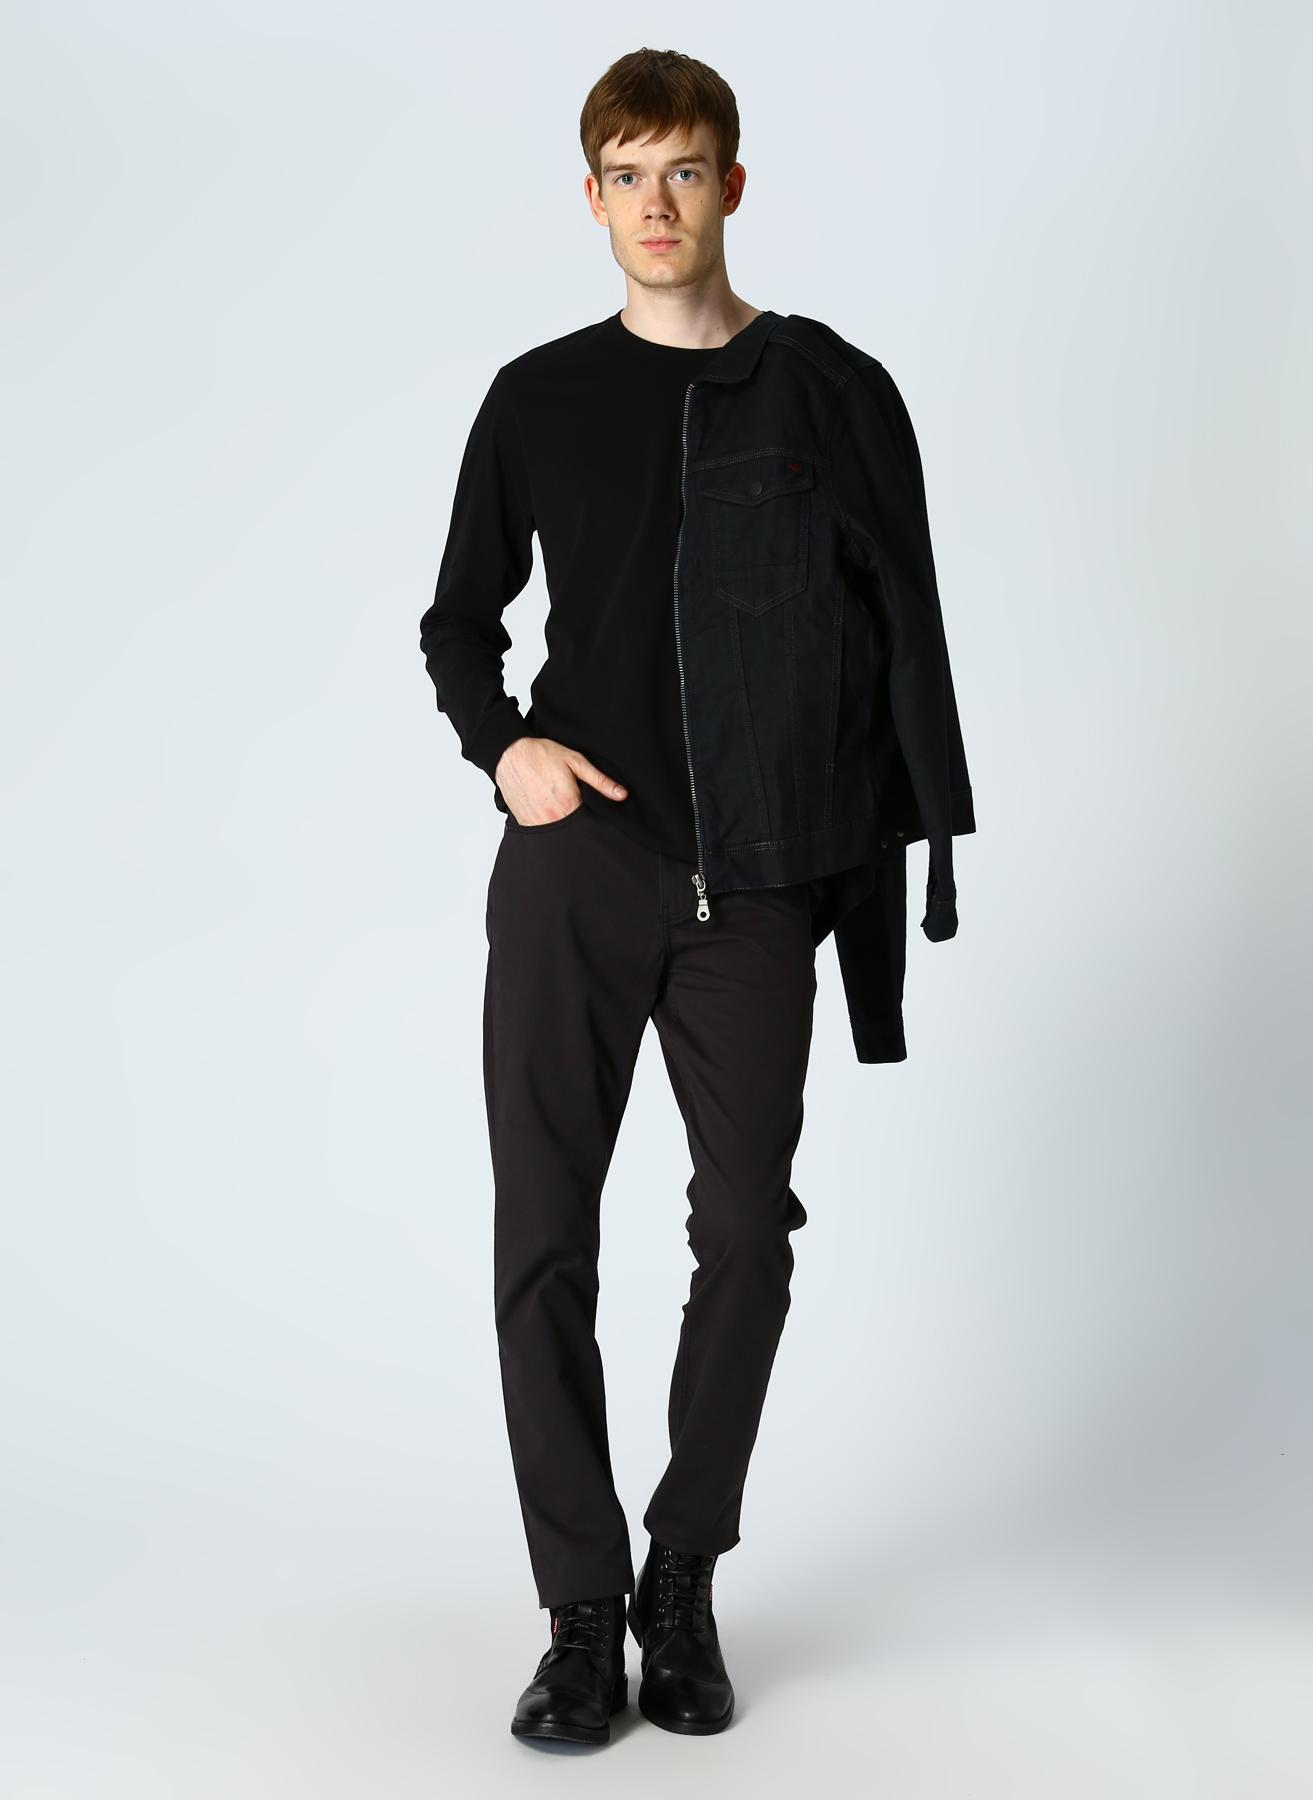 Lee Cooper Klasik Pantolon 34-32 5001699840017 Ürün Resmi